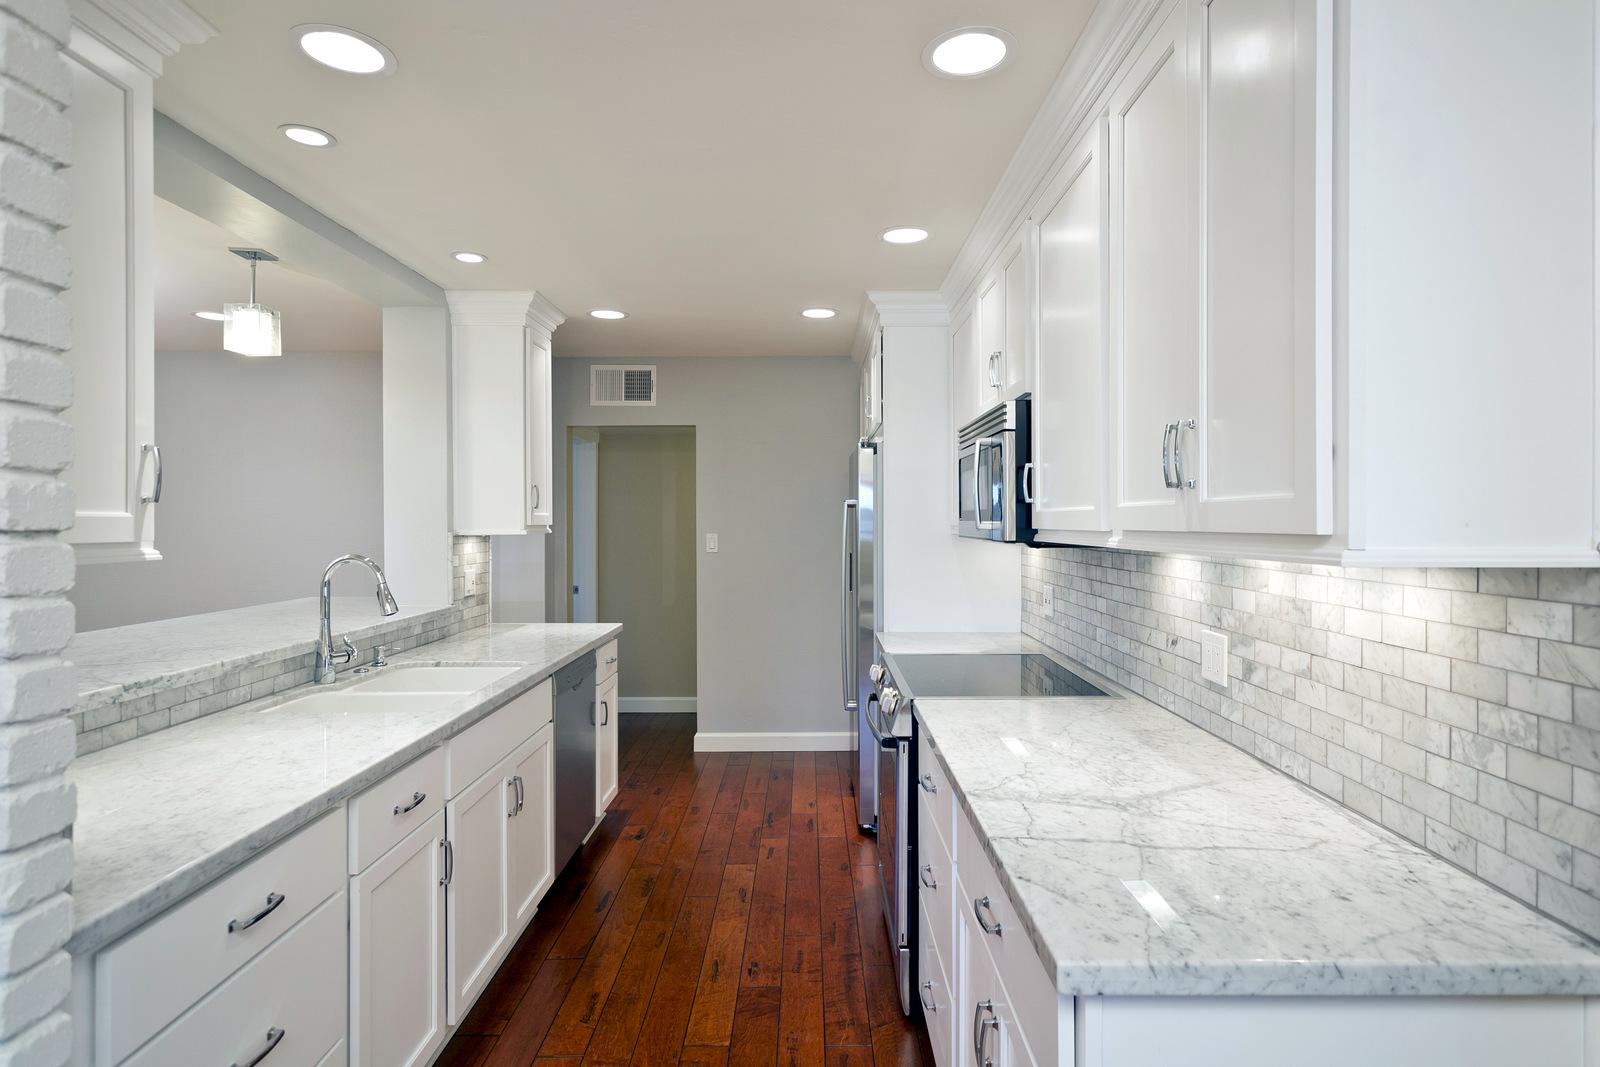 kitchen cabinet colors finishes kitchen remodel scottsdale Phoenix AZ Kitchen Cabinets in White